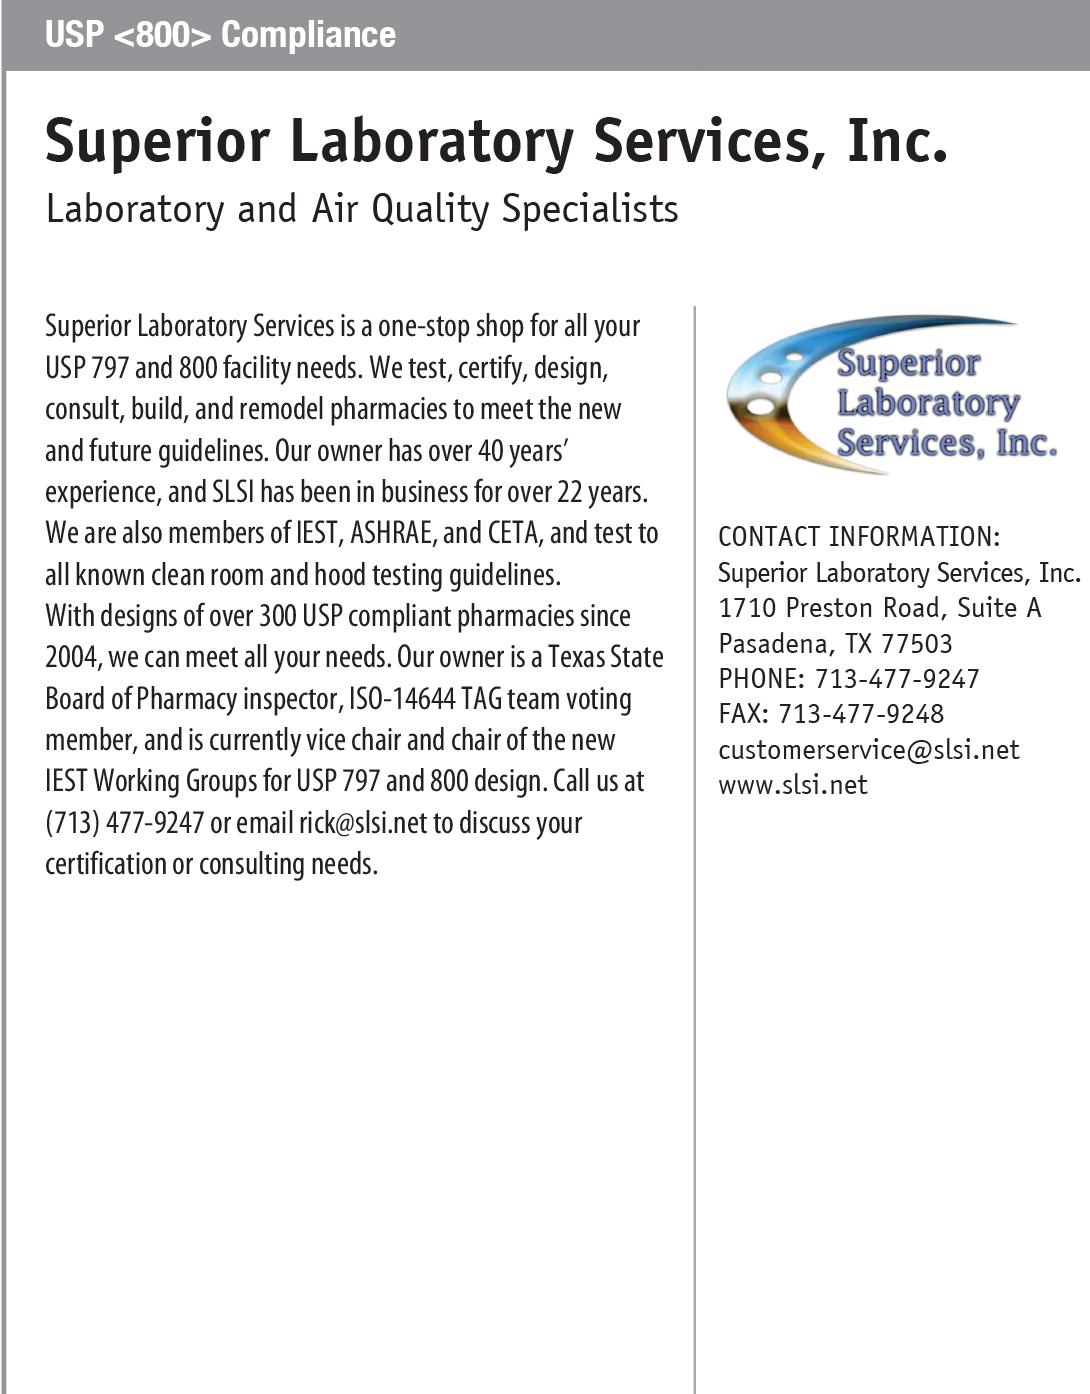 PROFILE_USP-_800_-Compliance---Superior-Laboratory-Services,-Inc..jpg